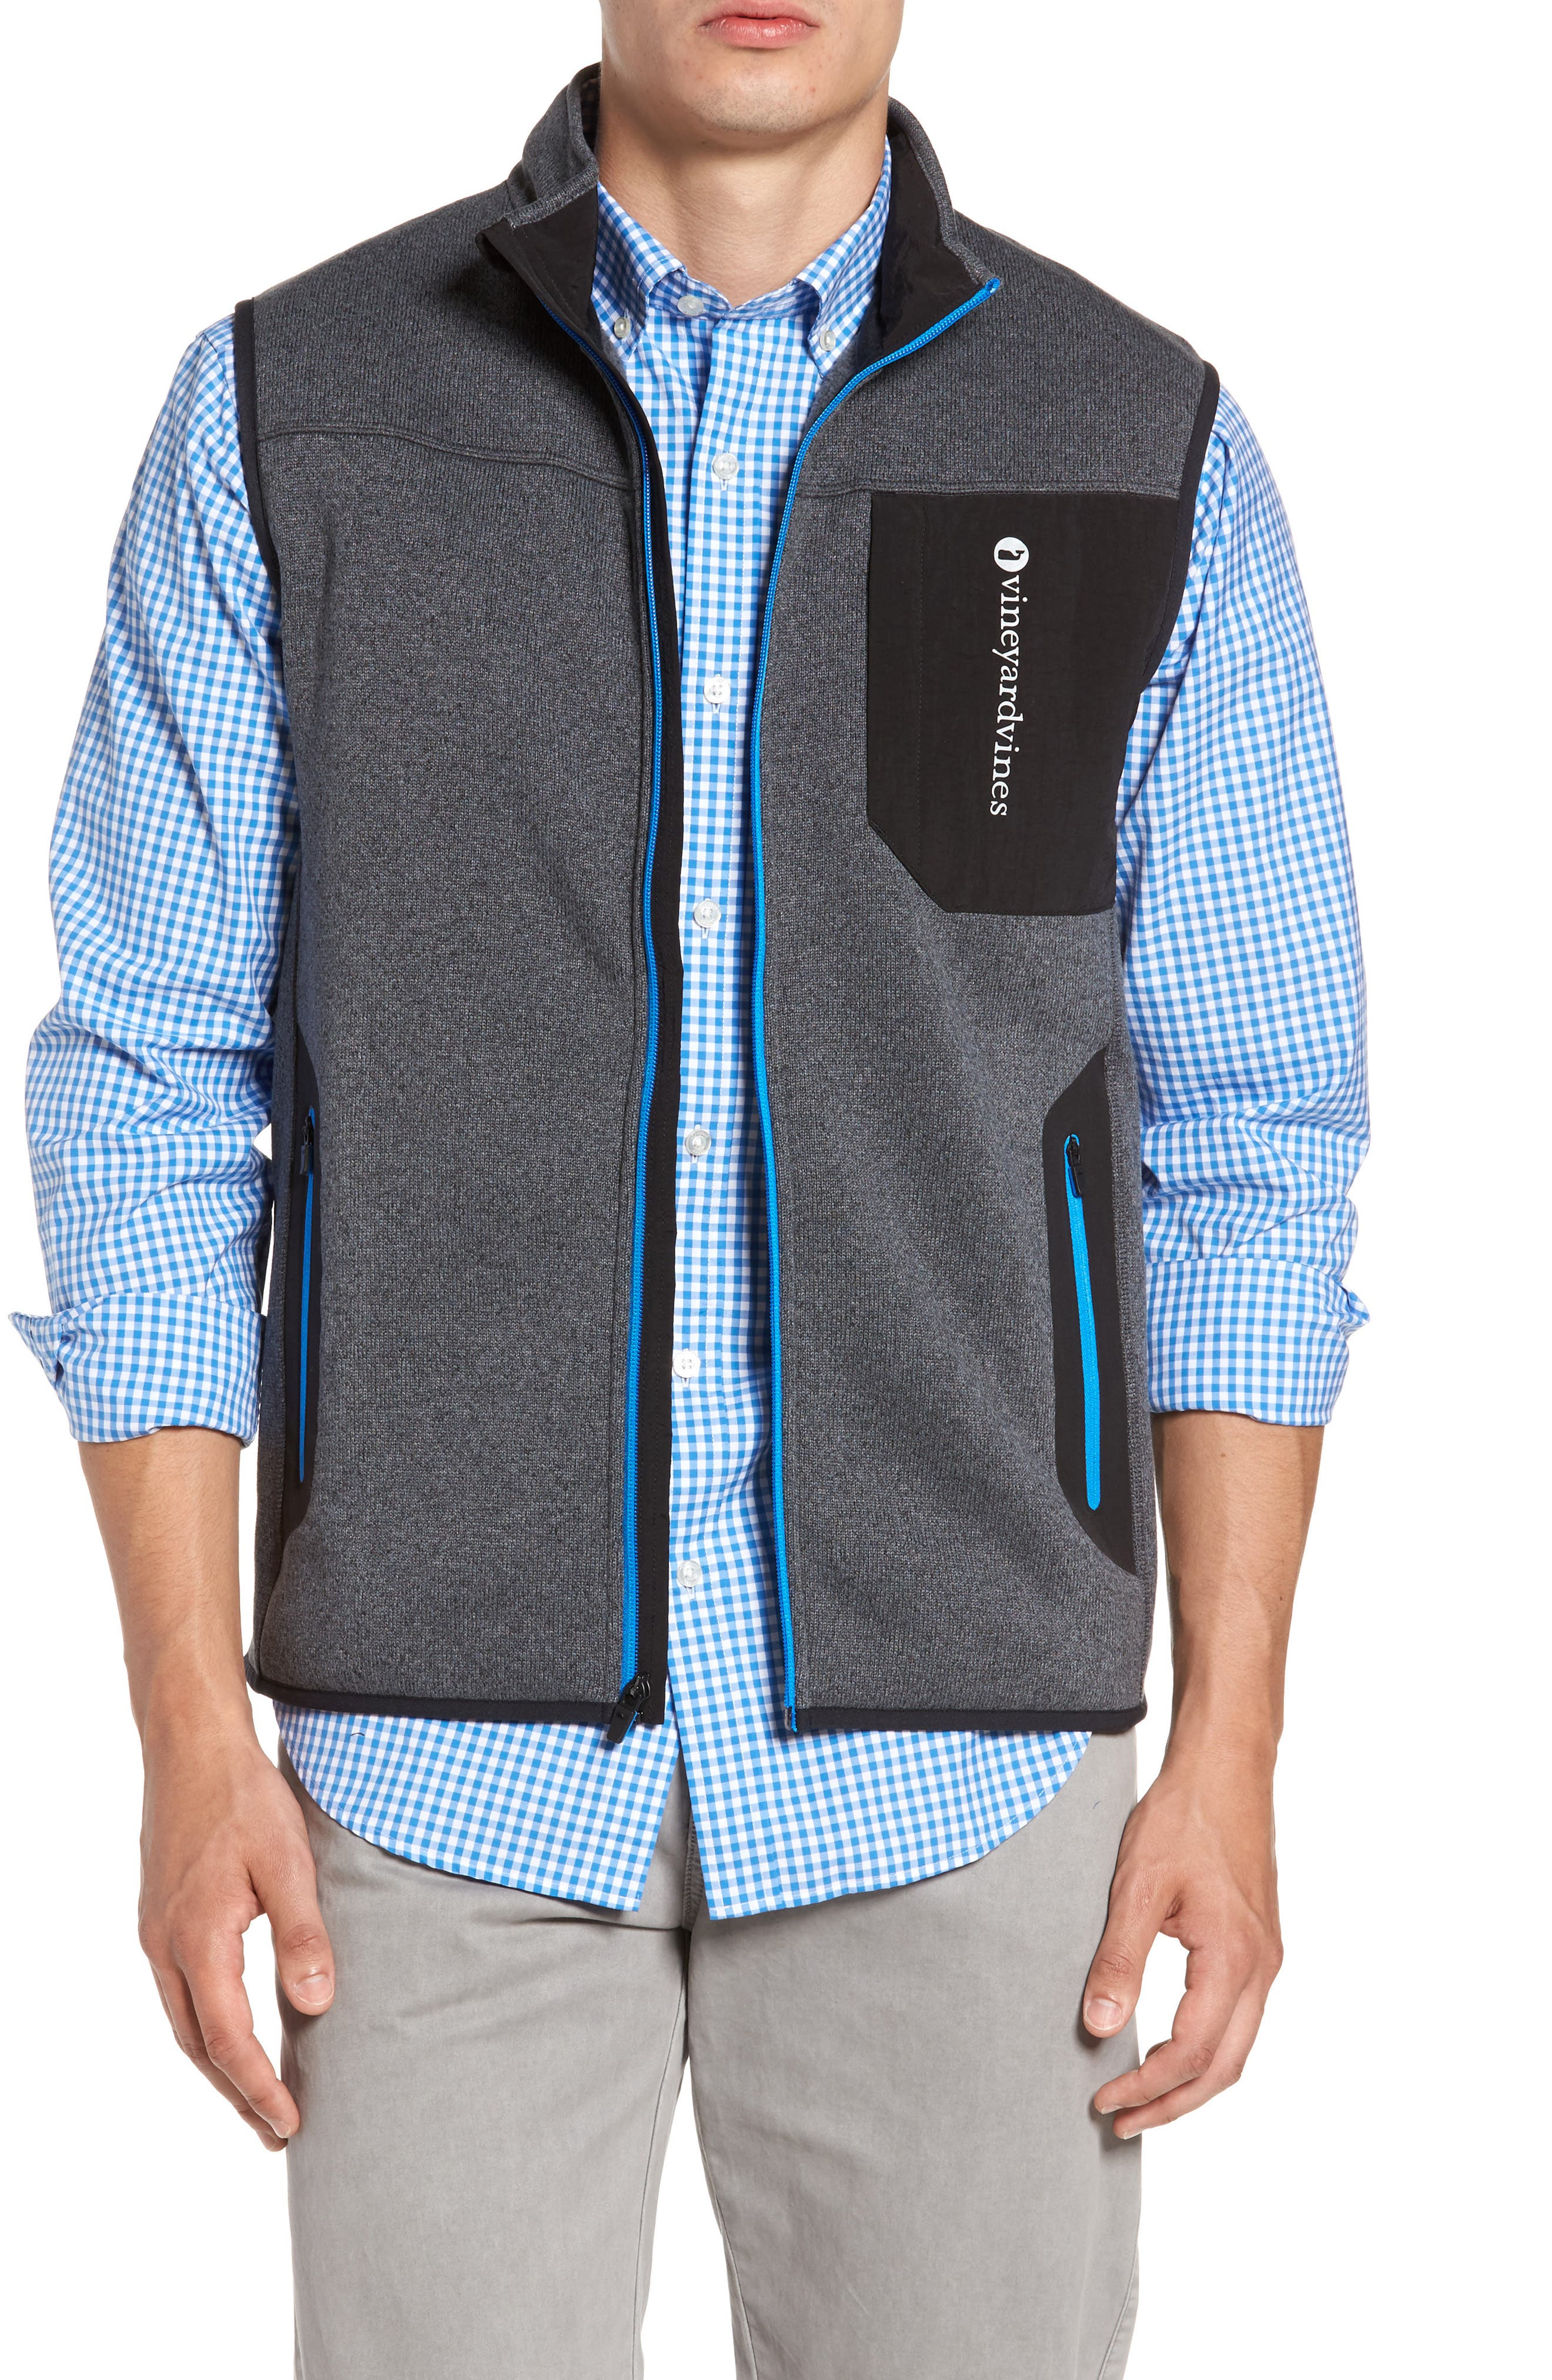 Alternate Image 1 Selected - vineyard vines Tech Sweater Fleece Vest